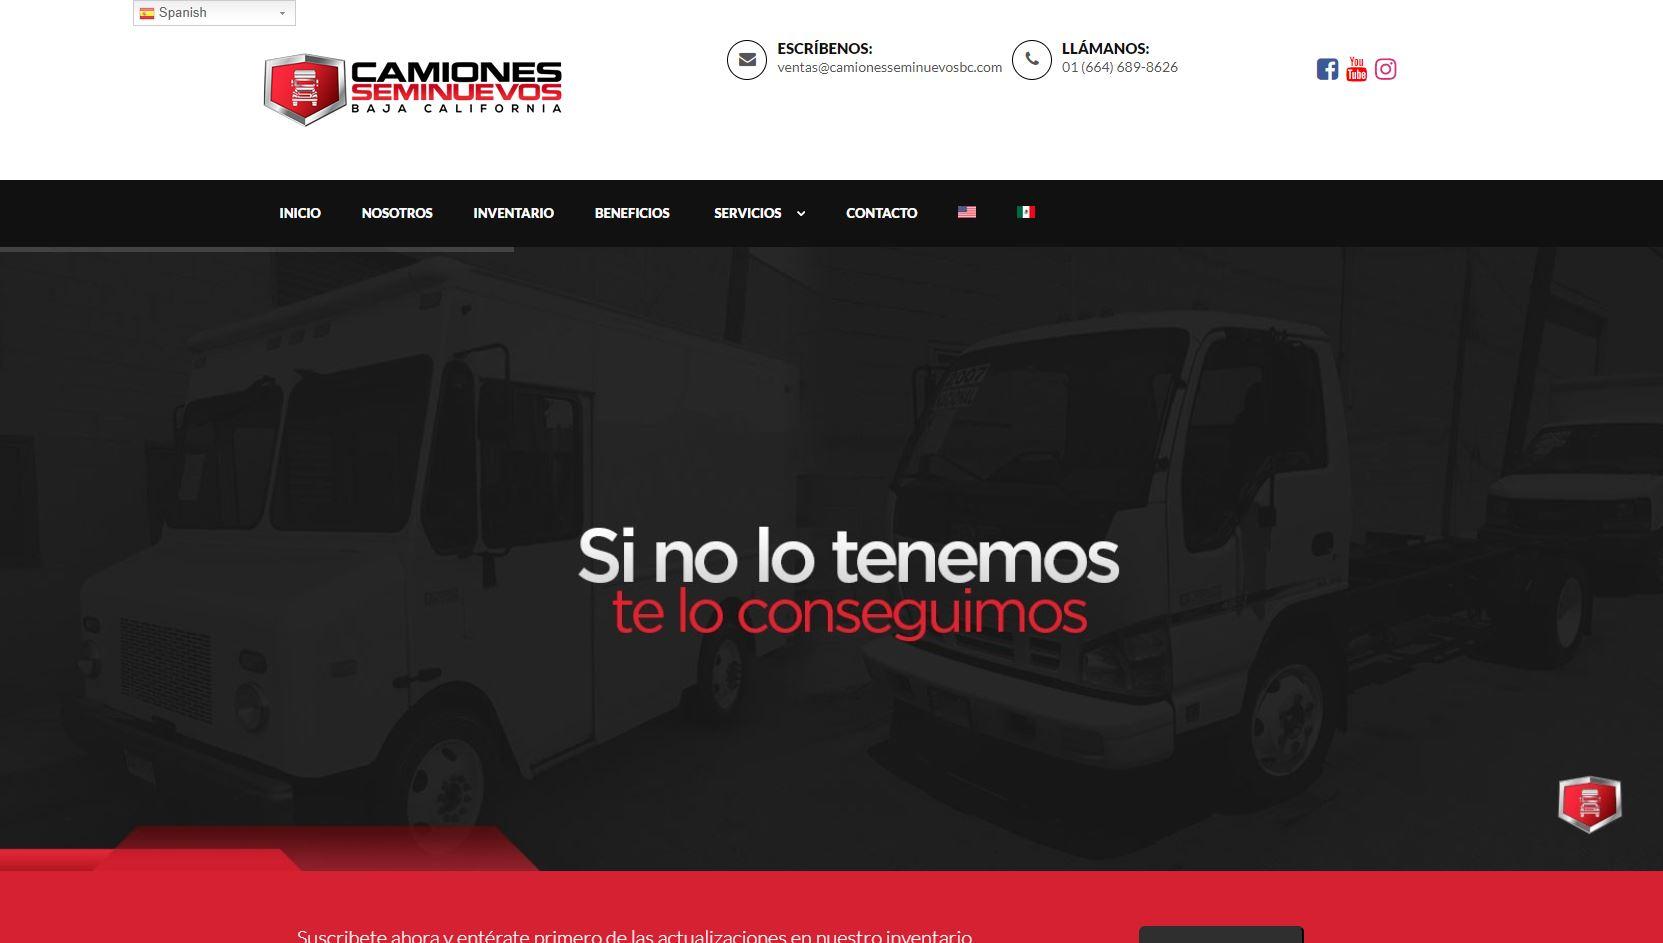 Camiones Seminuevos Baja California